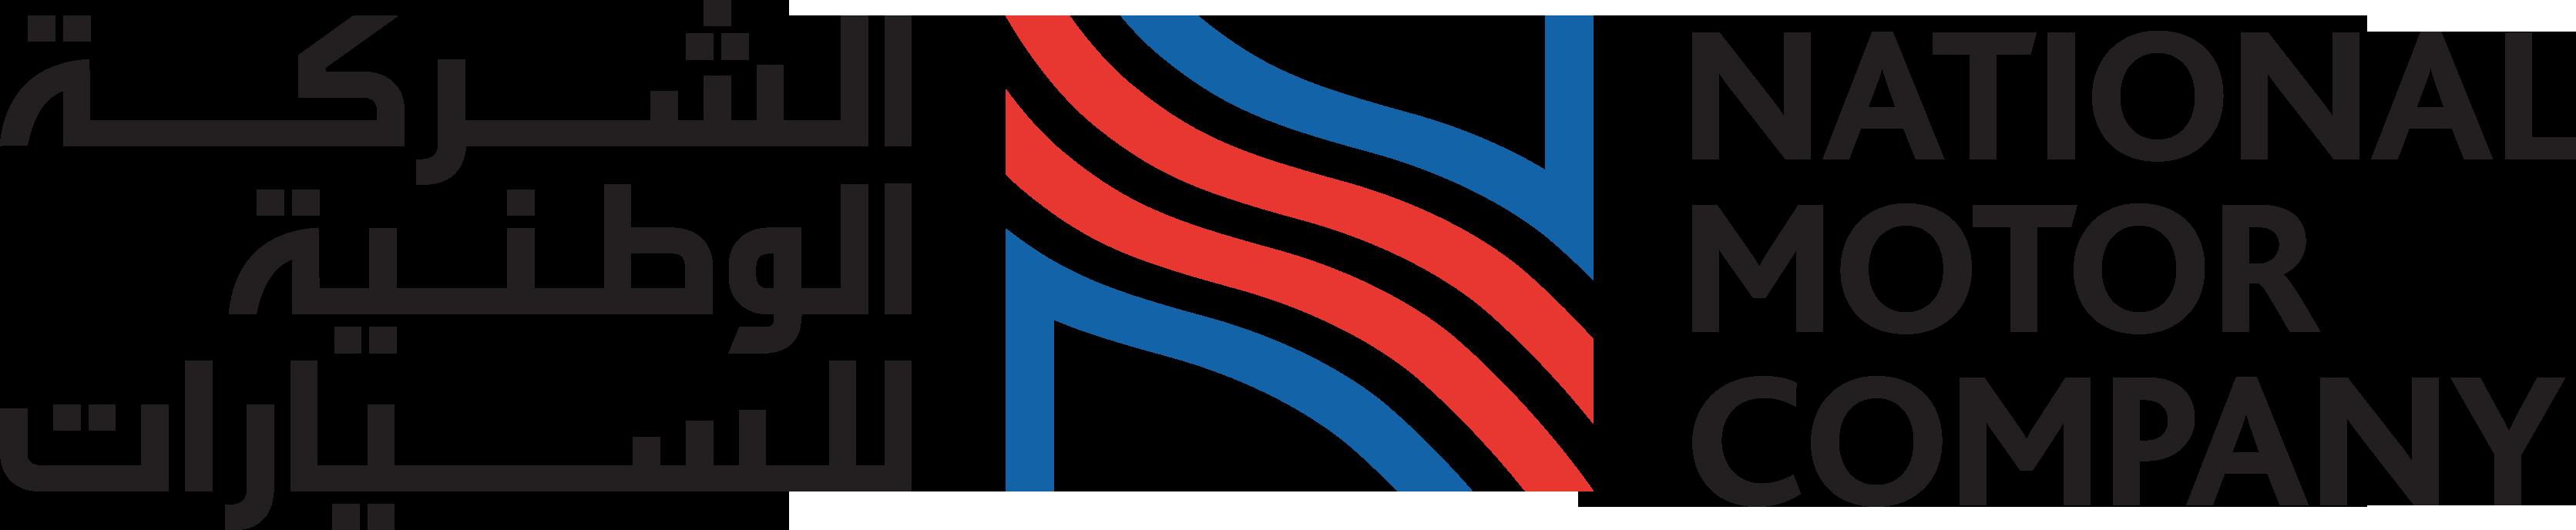 National Motors Company